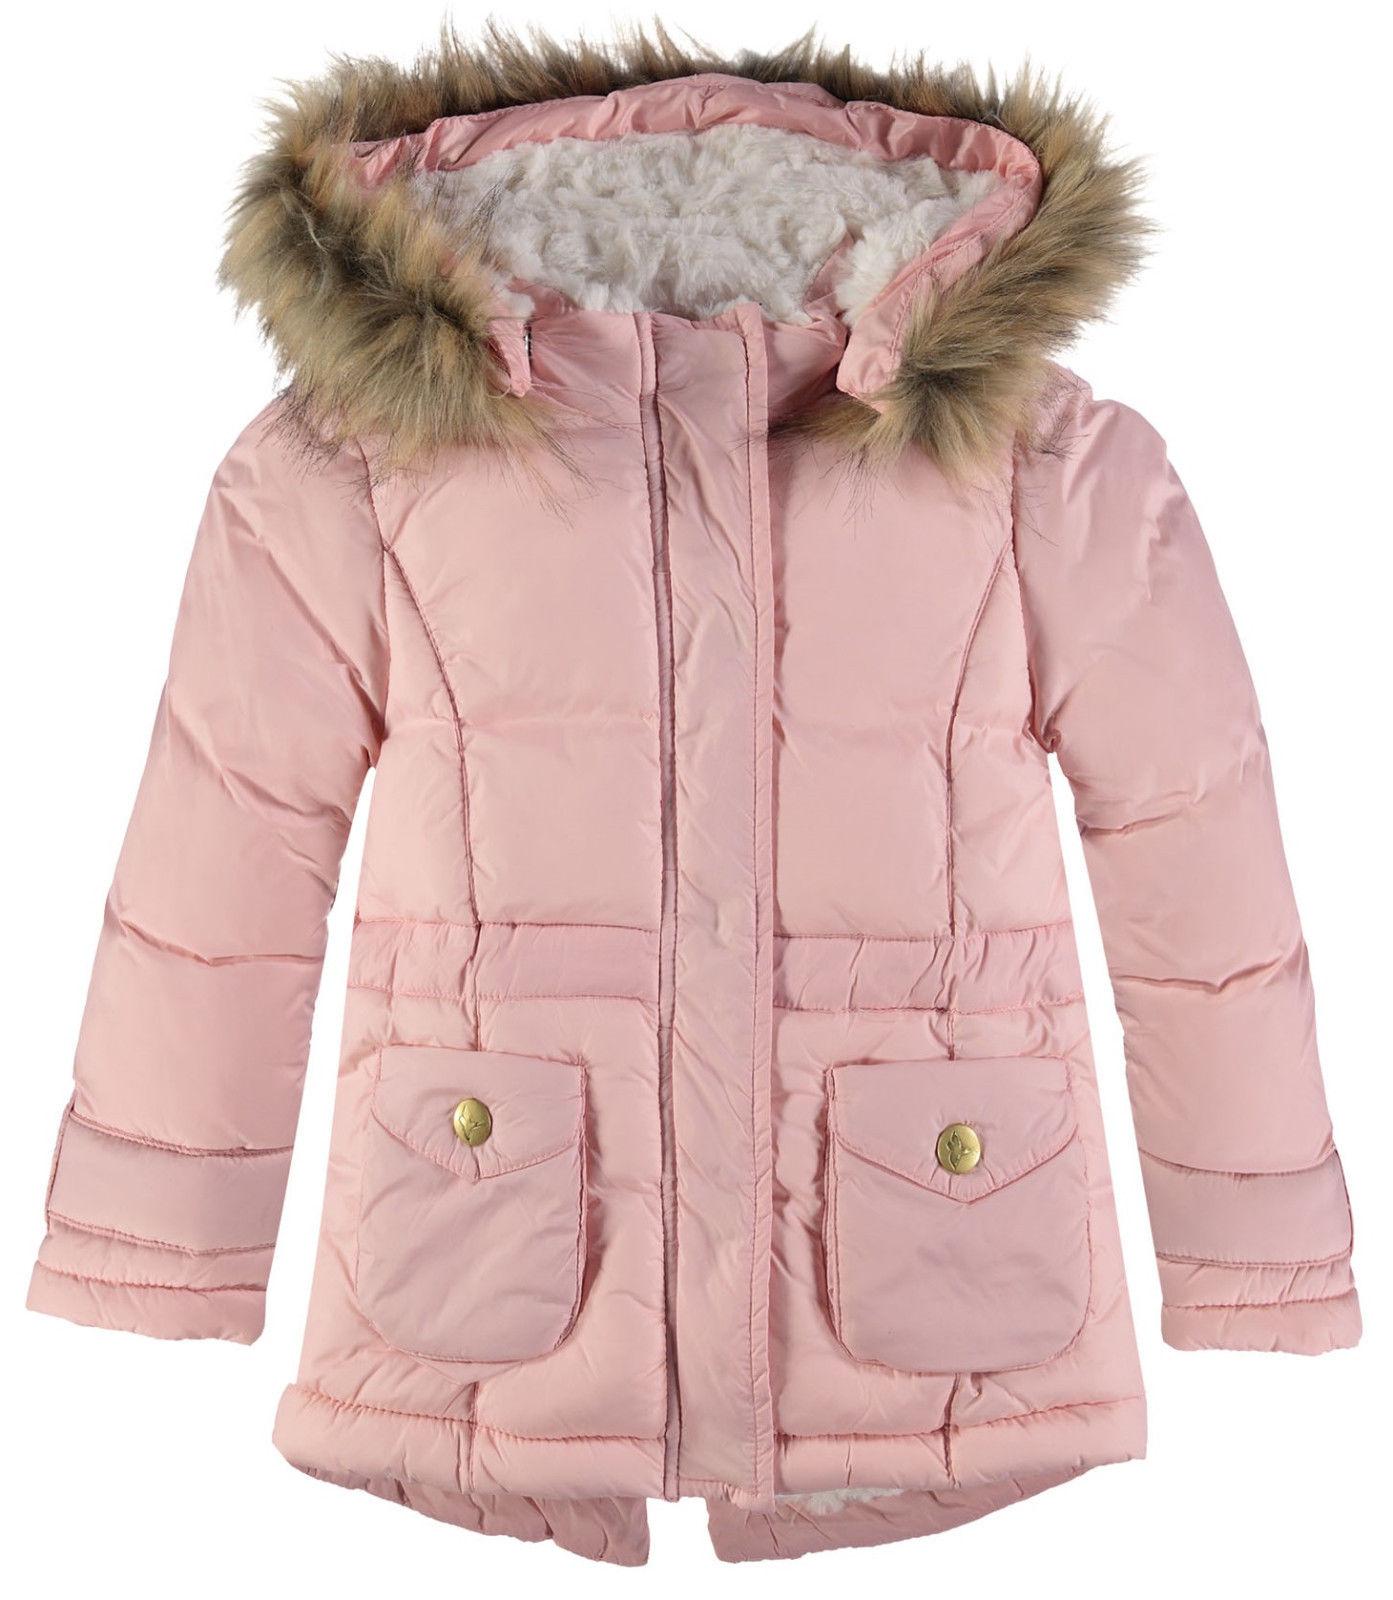 Kanz winterjacke rosa